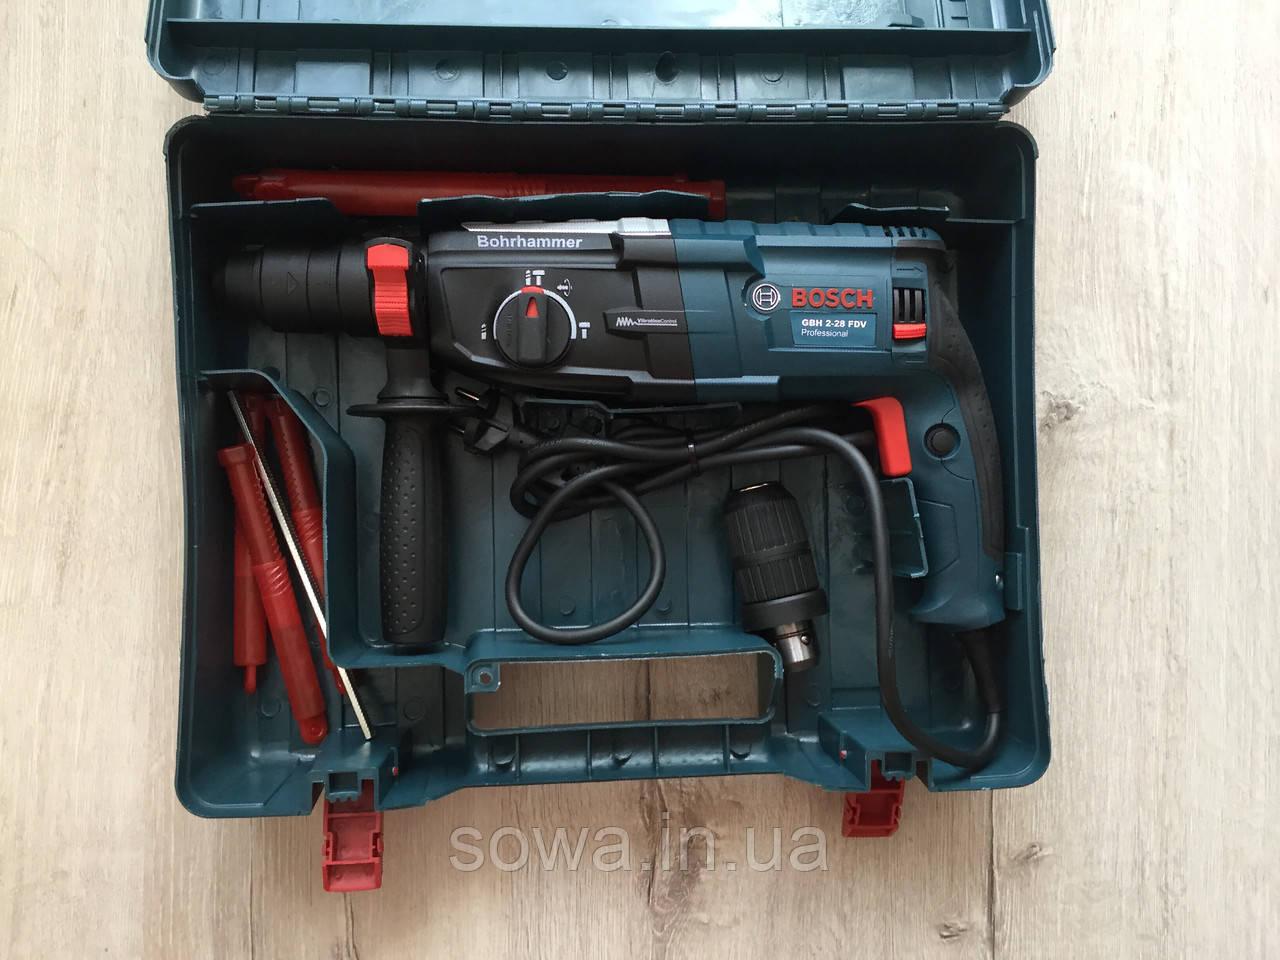 ✔️ Перфоратор  Bosch_Бош 2-28 DFV  |  850 Вт, SDS-Plus